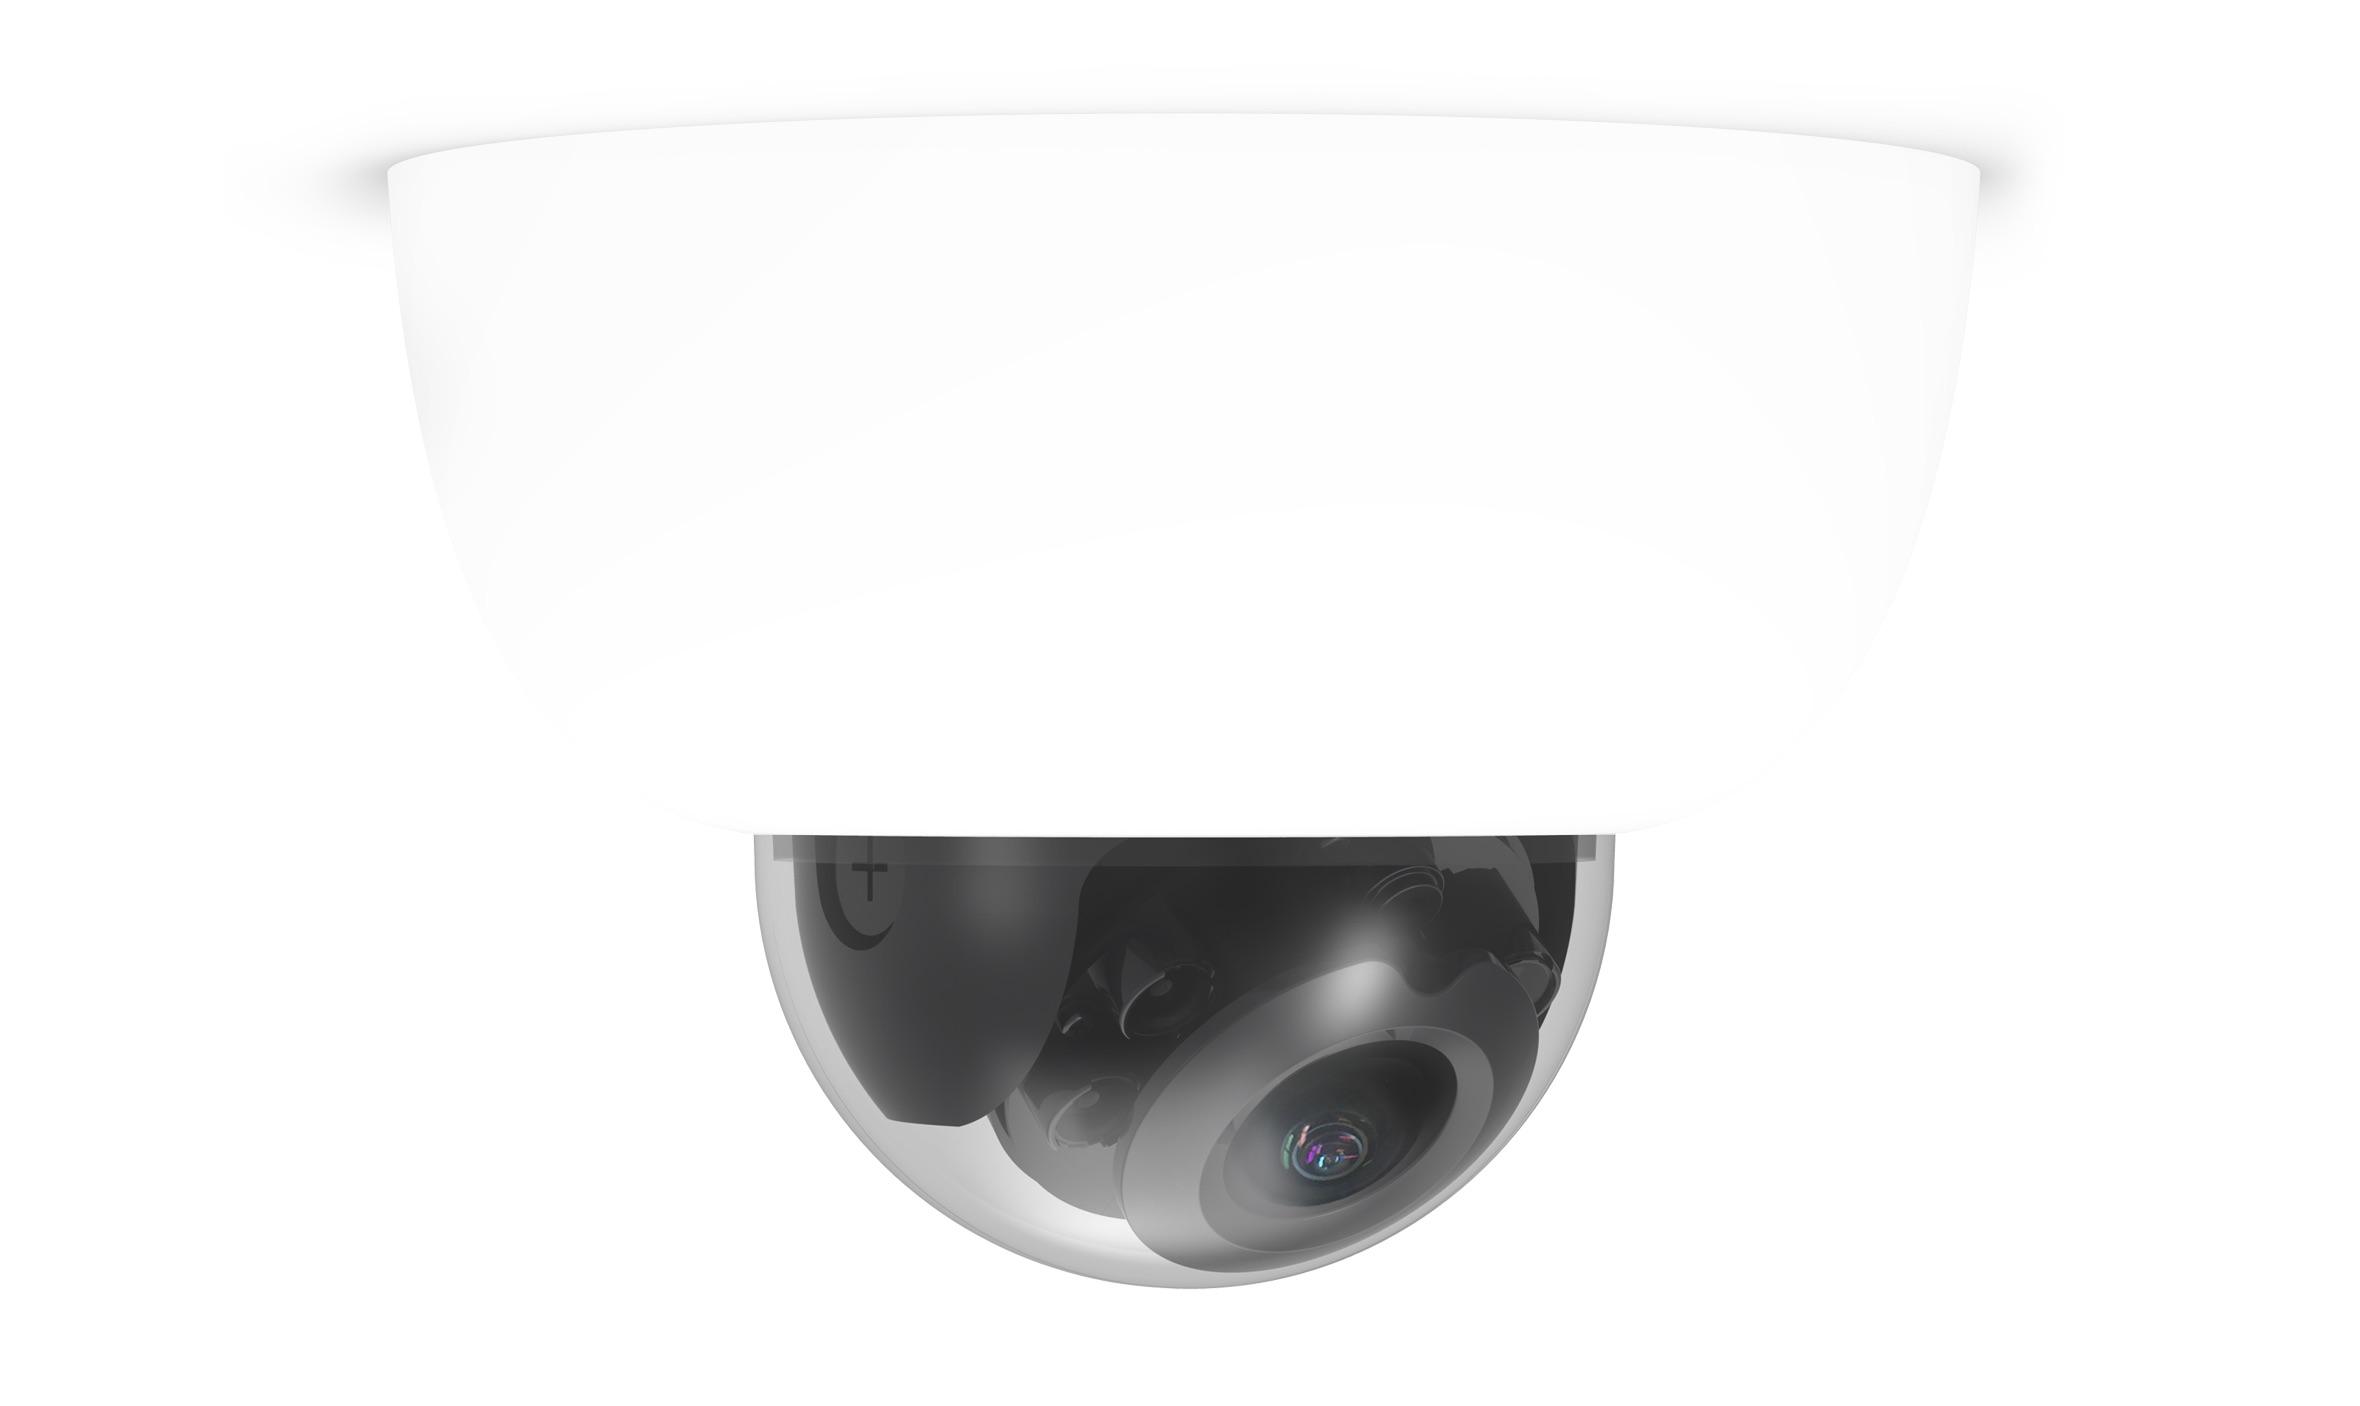 Cisco Meraki Security Camera